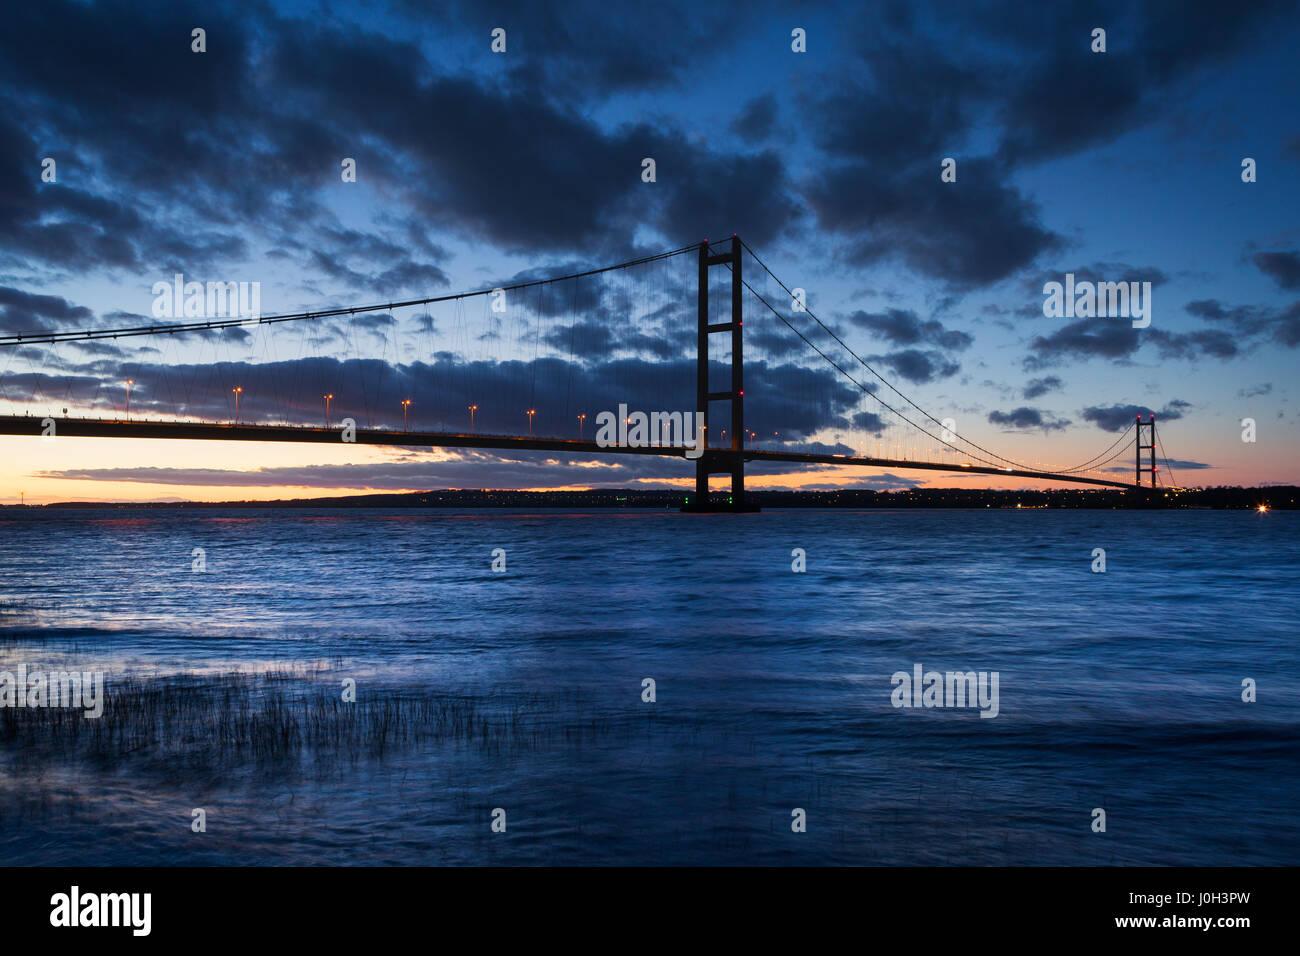 Cyberheritage, Plymouth History, Naval and Military History David lee photography barton upon humber